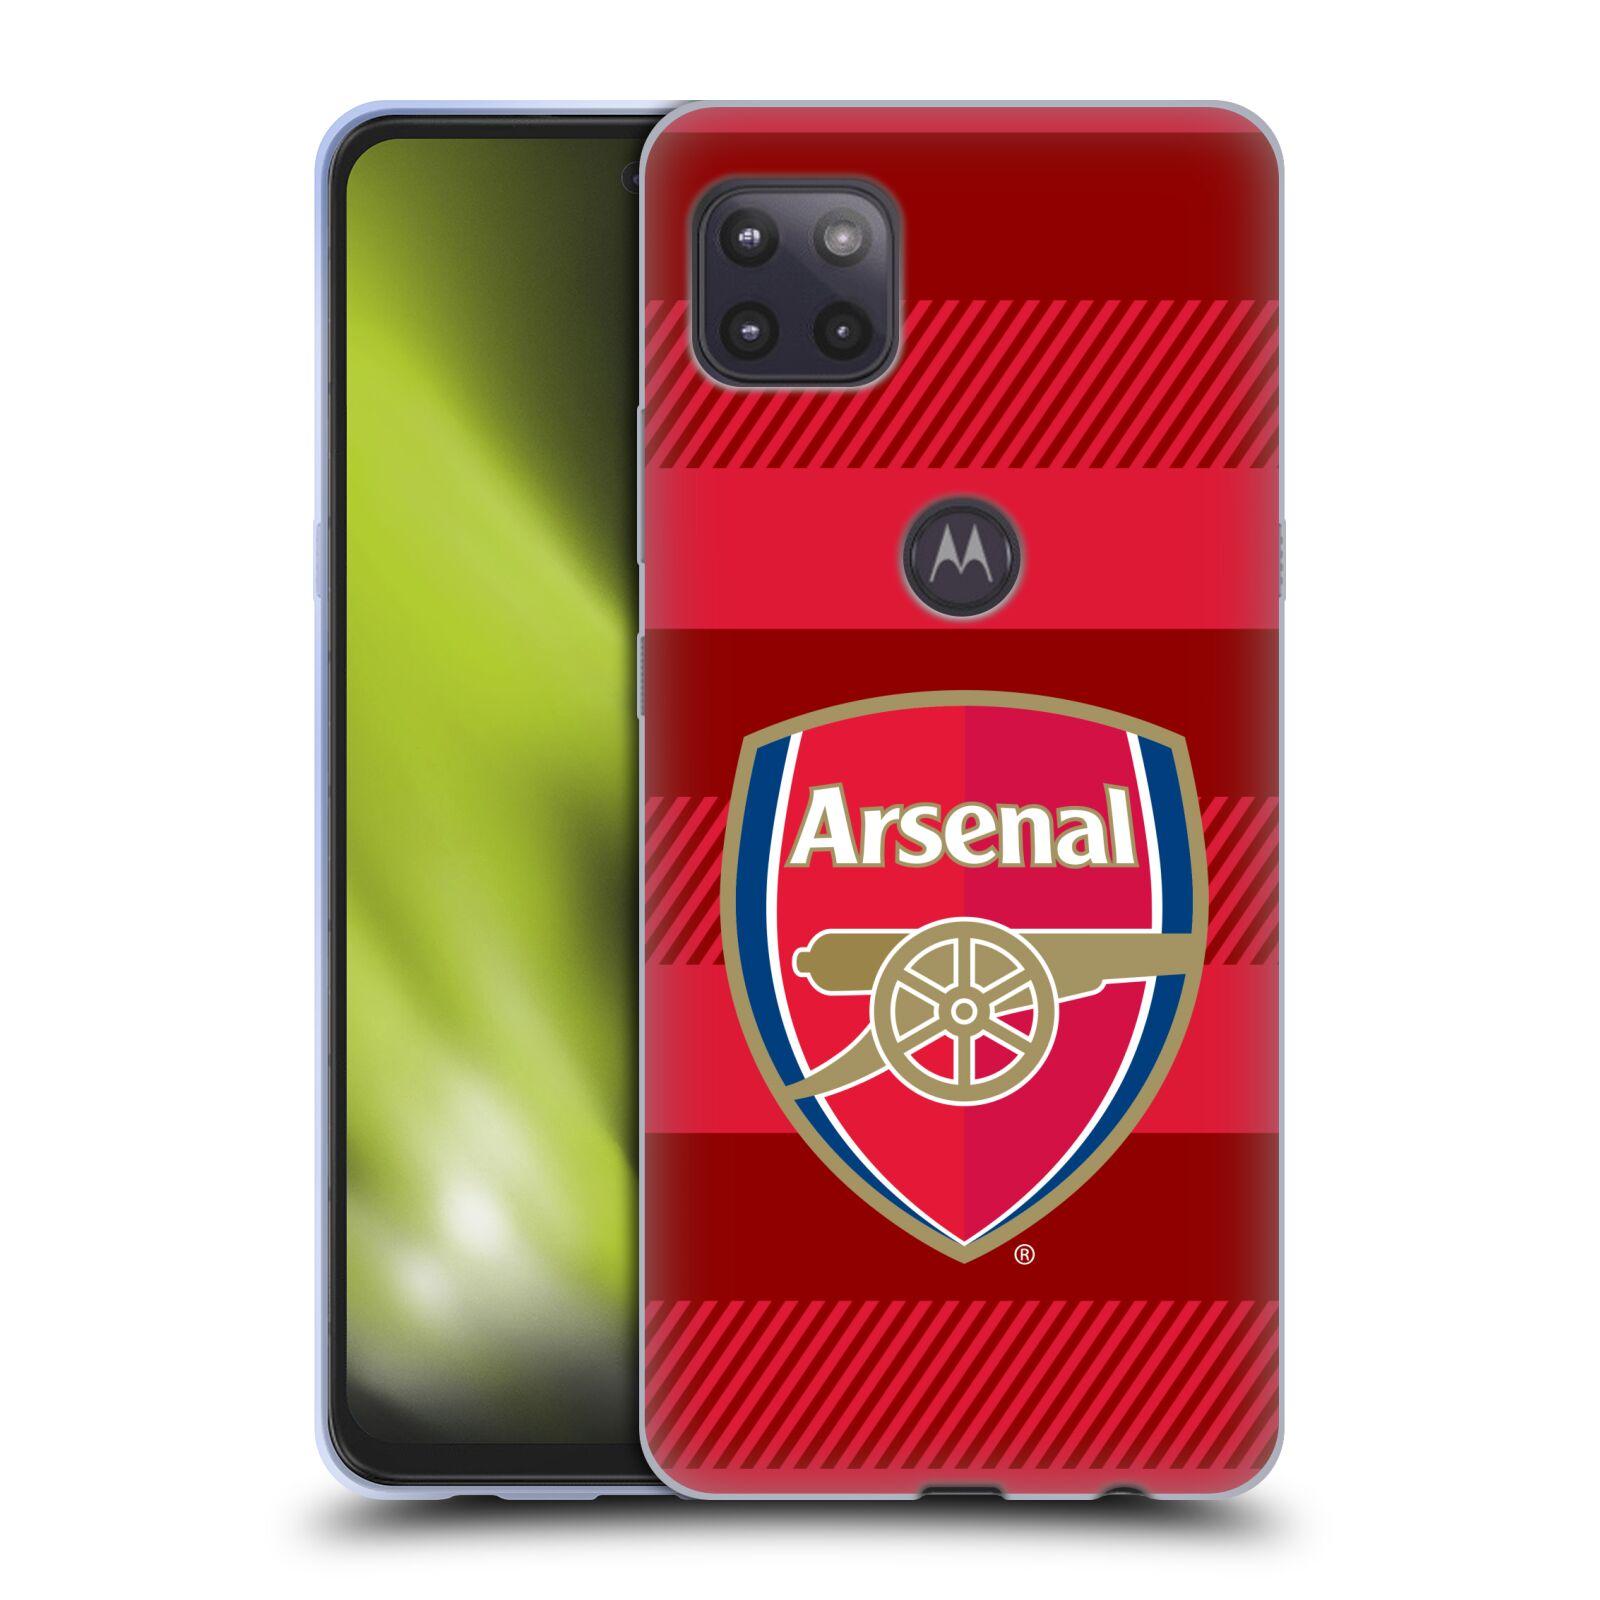 Silikonové pouzdro na mobil Motorola Moto G 5G - Head Case - Arsenal FC - Logo s pruhy